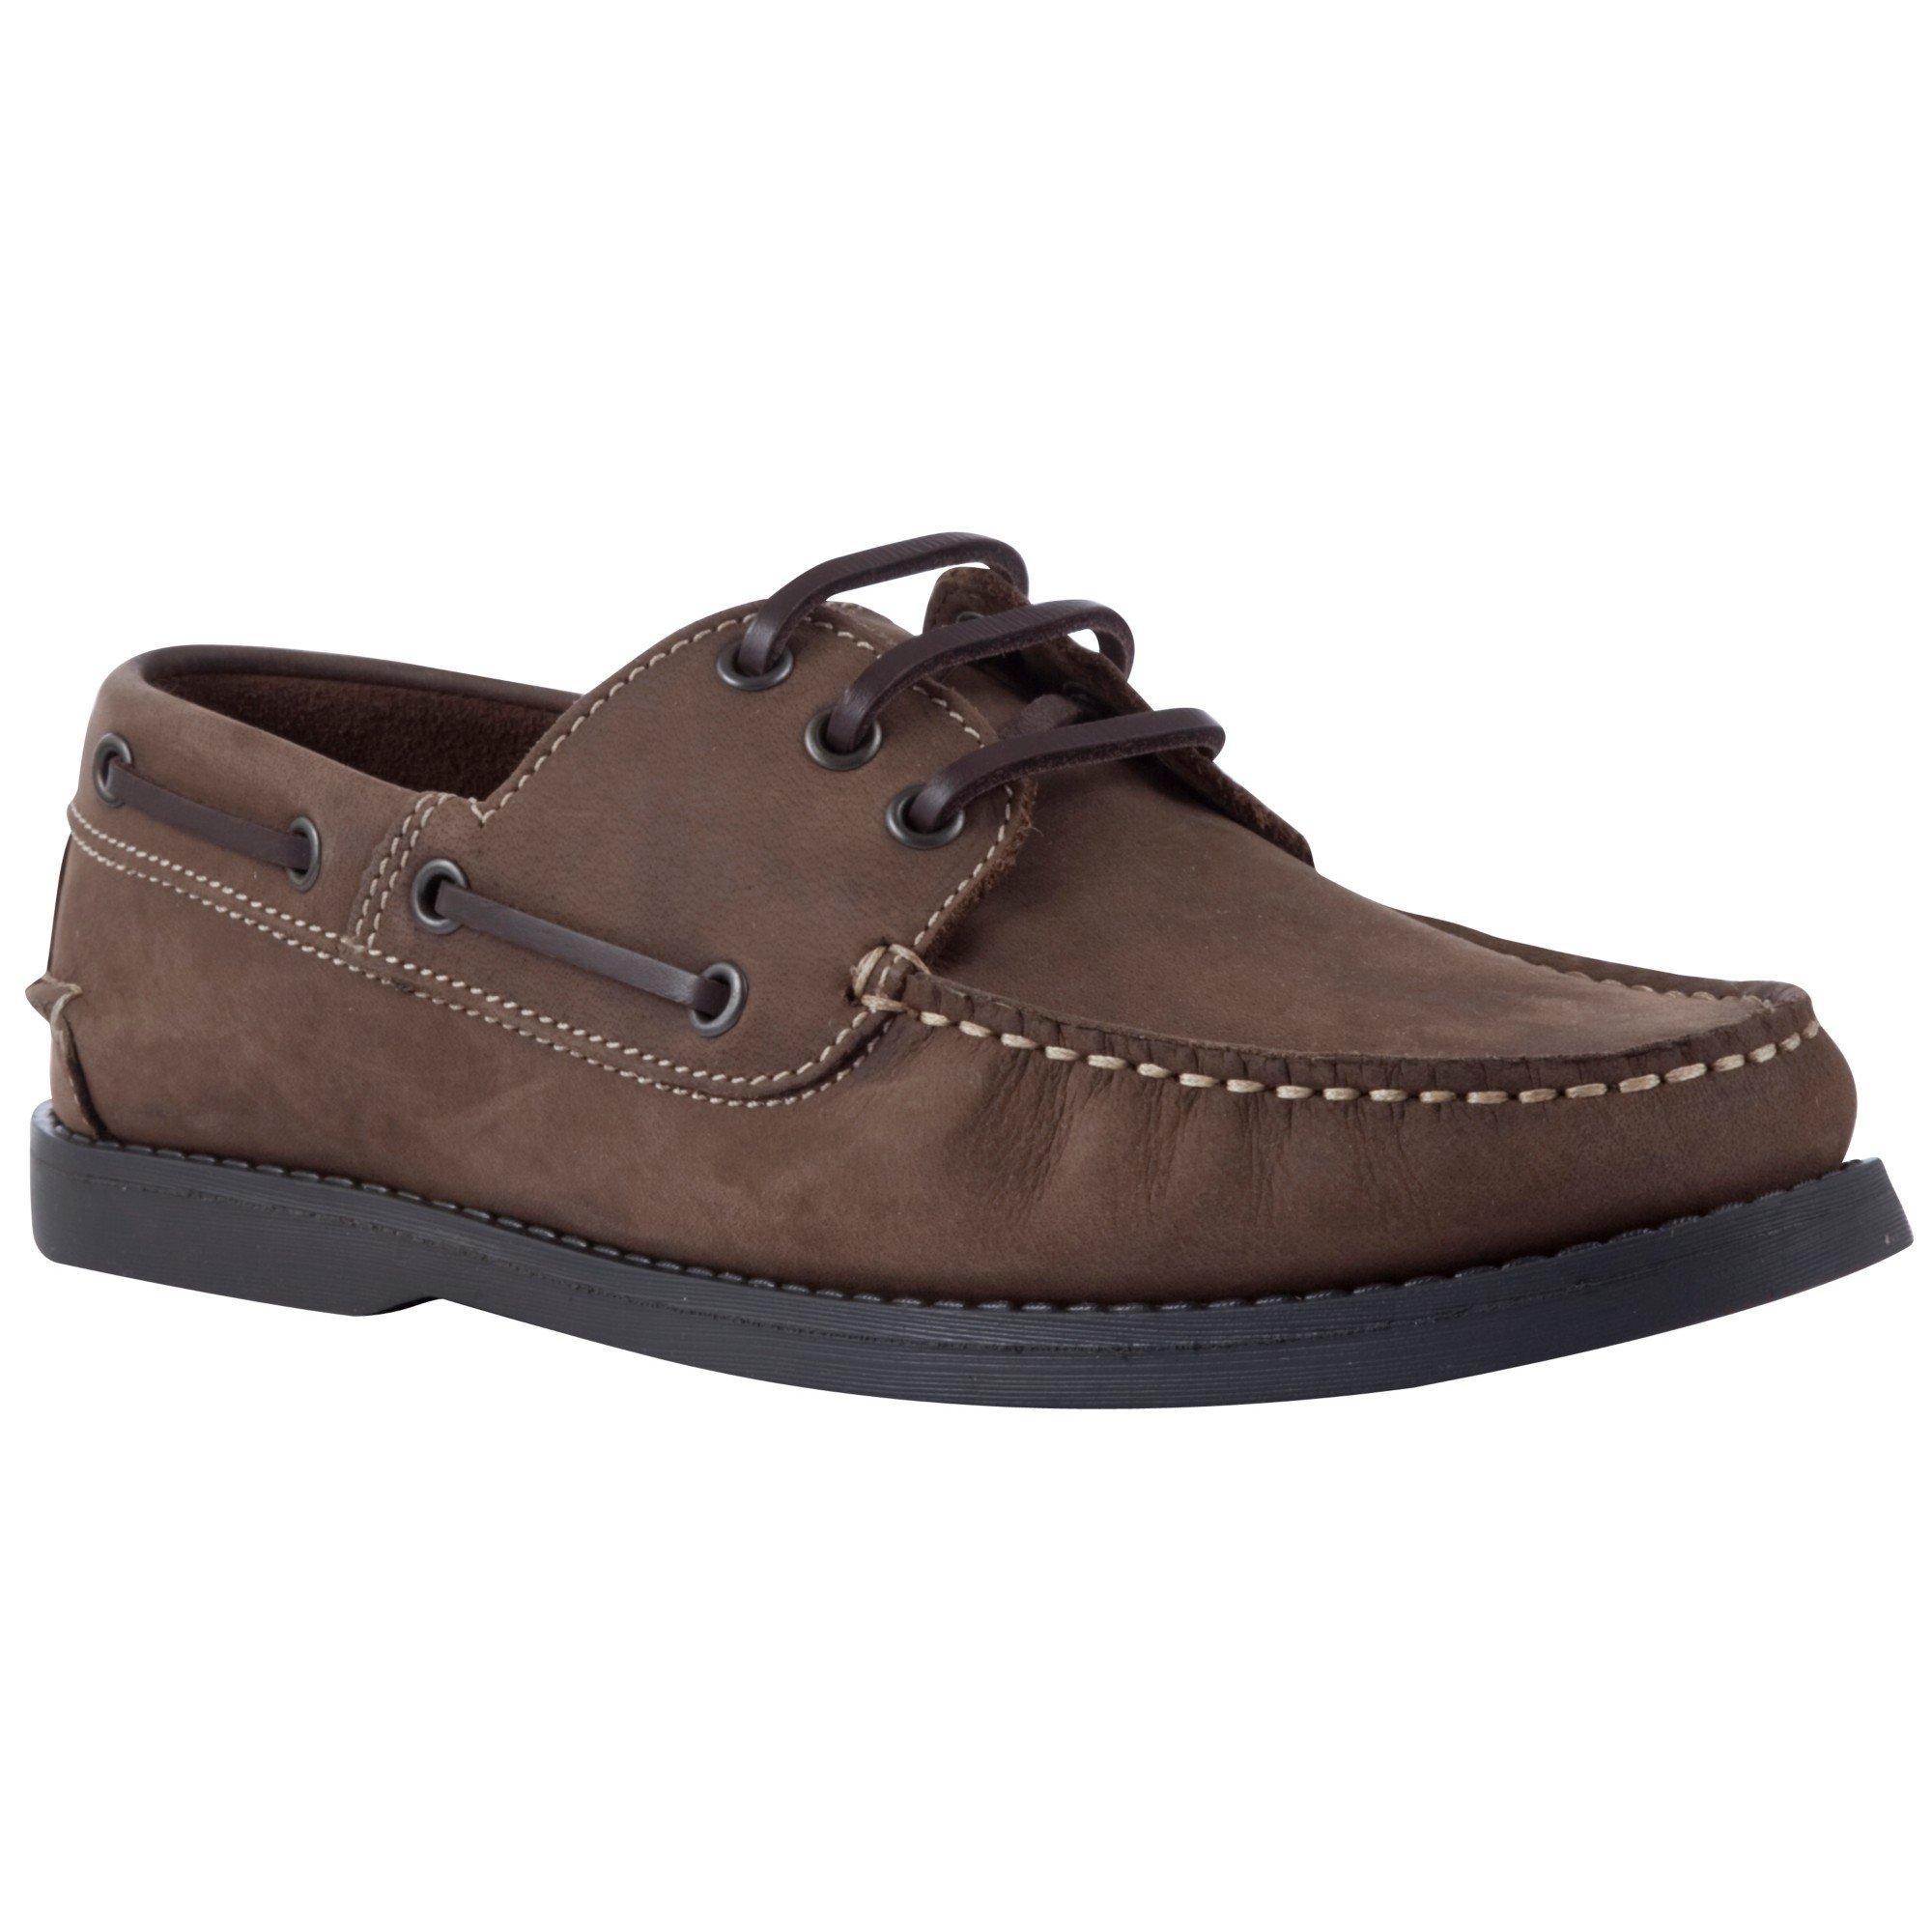 John Lewiss Mens Shoes For Sale